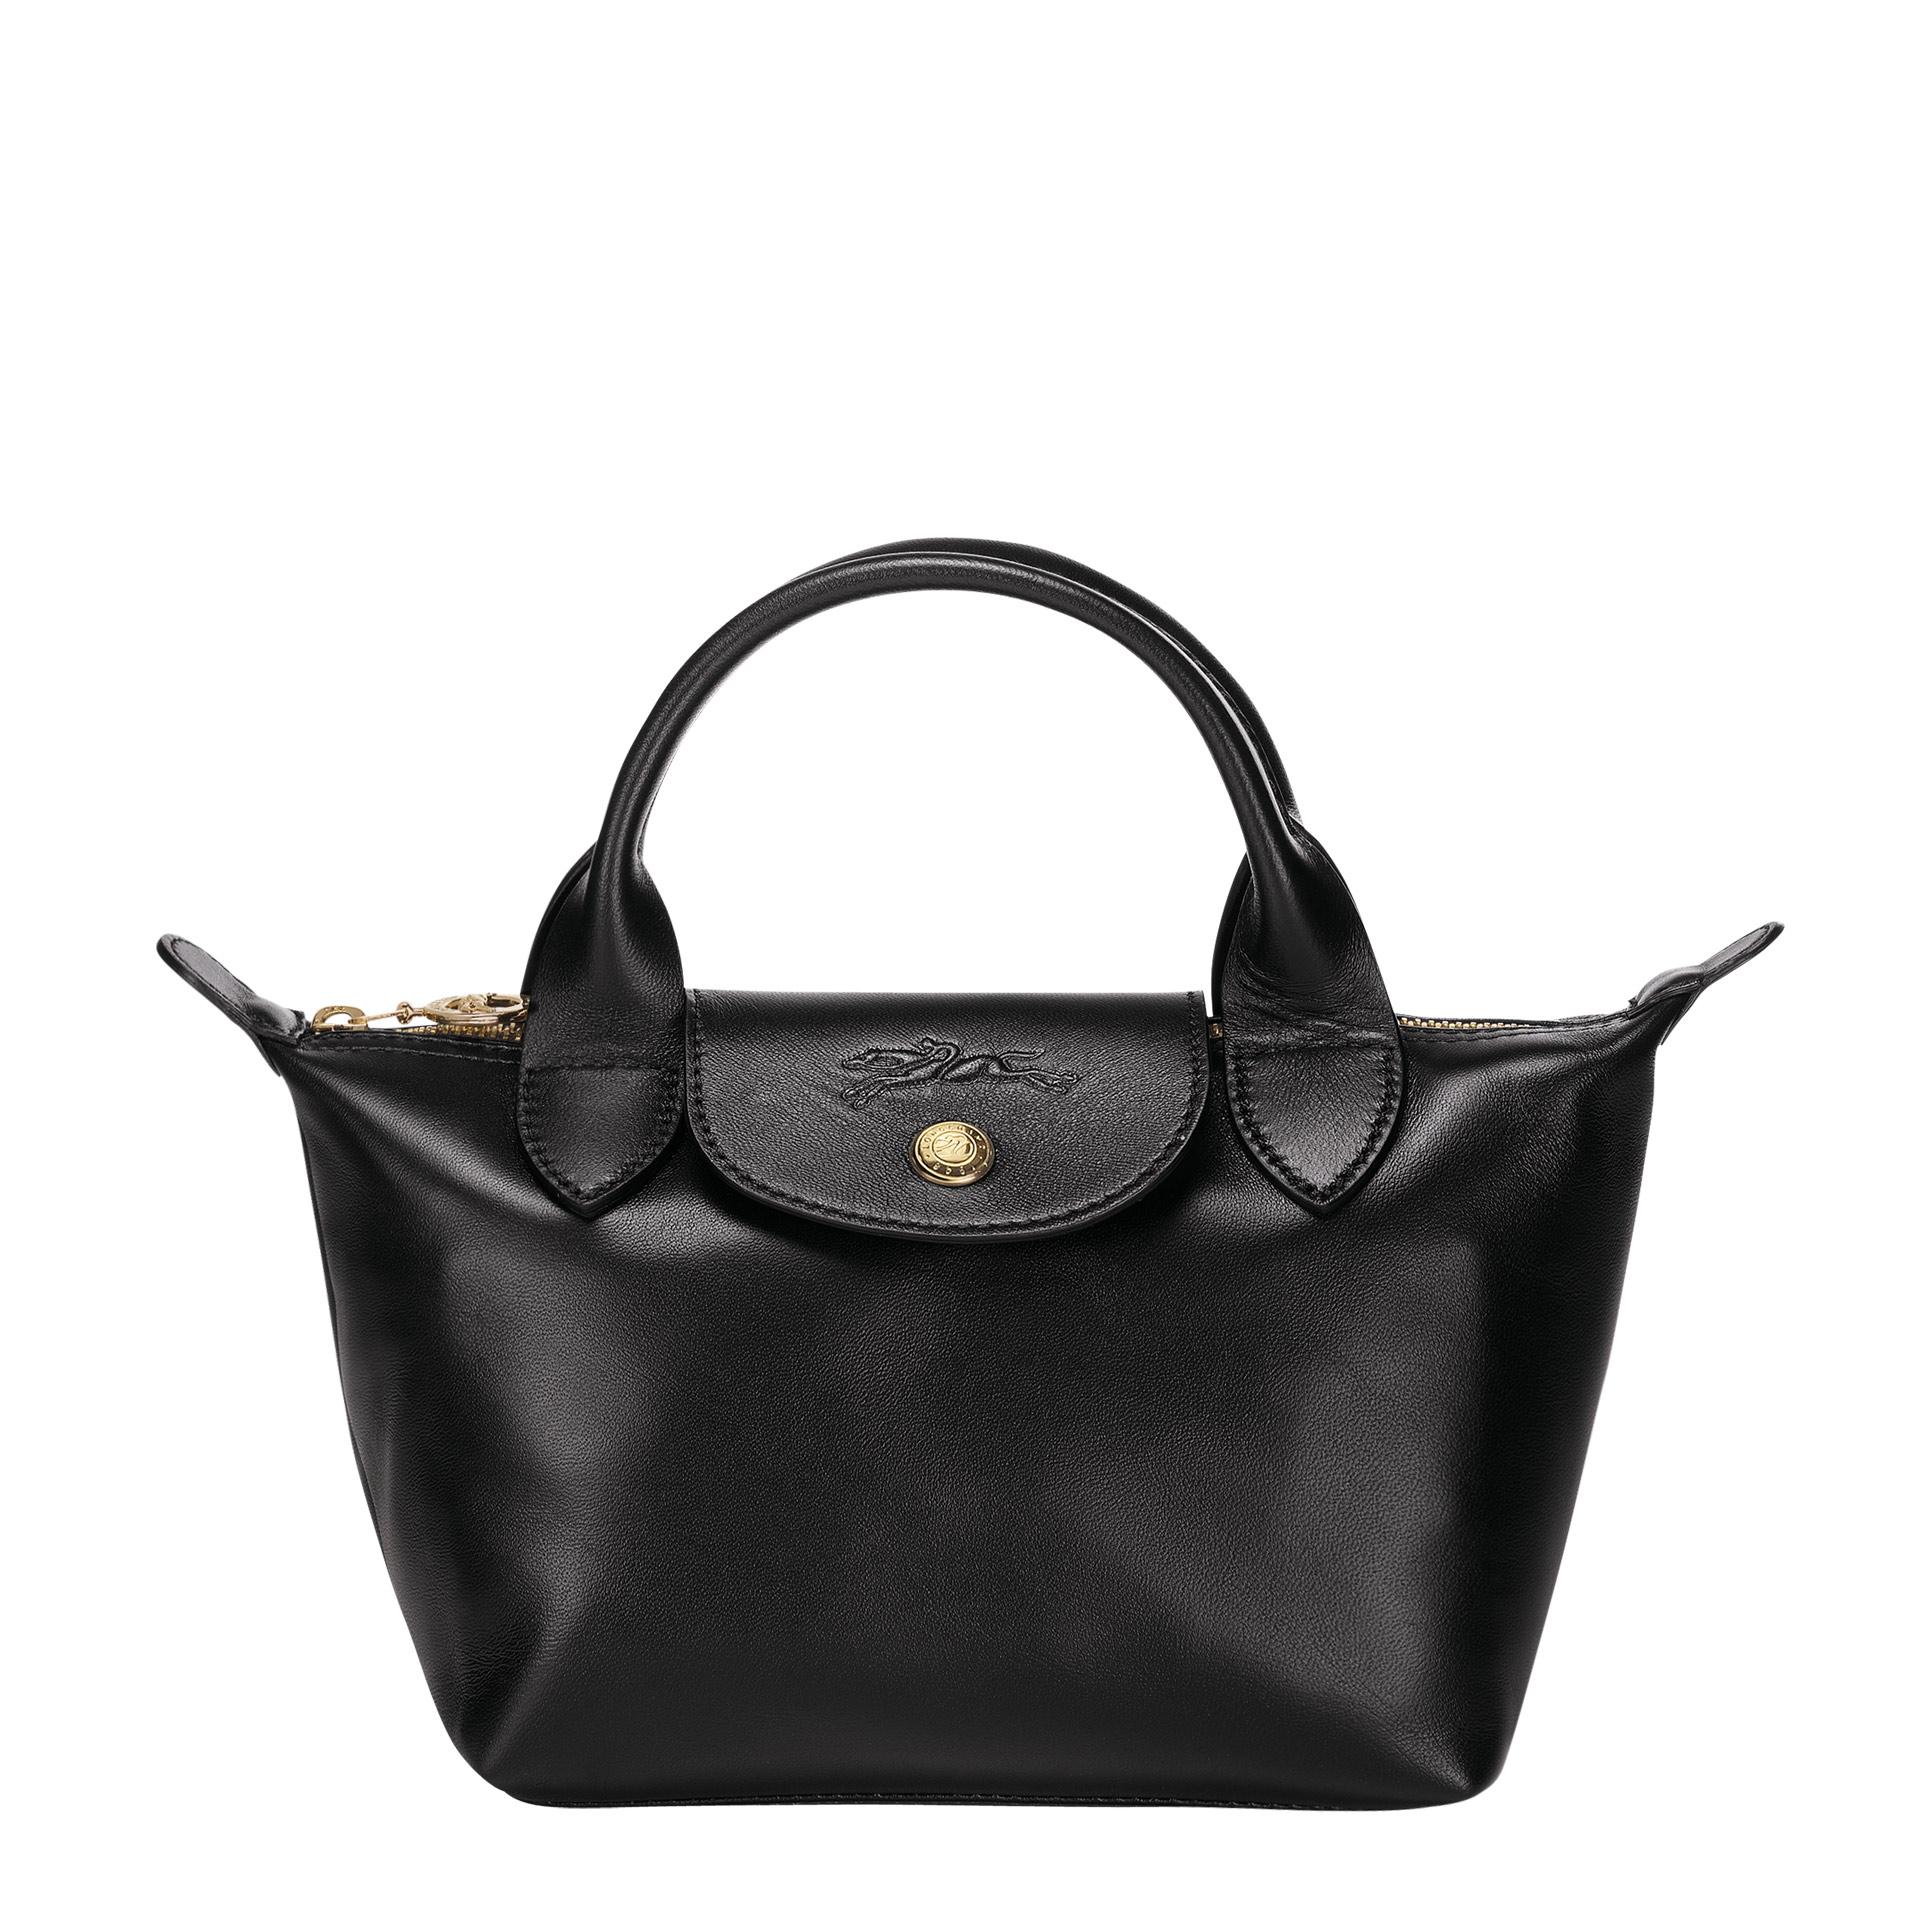 Le Pliage Cuir Mini Handtasche black